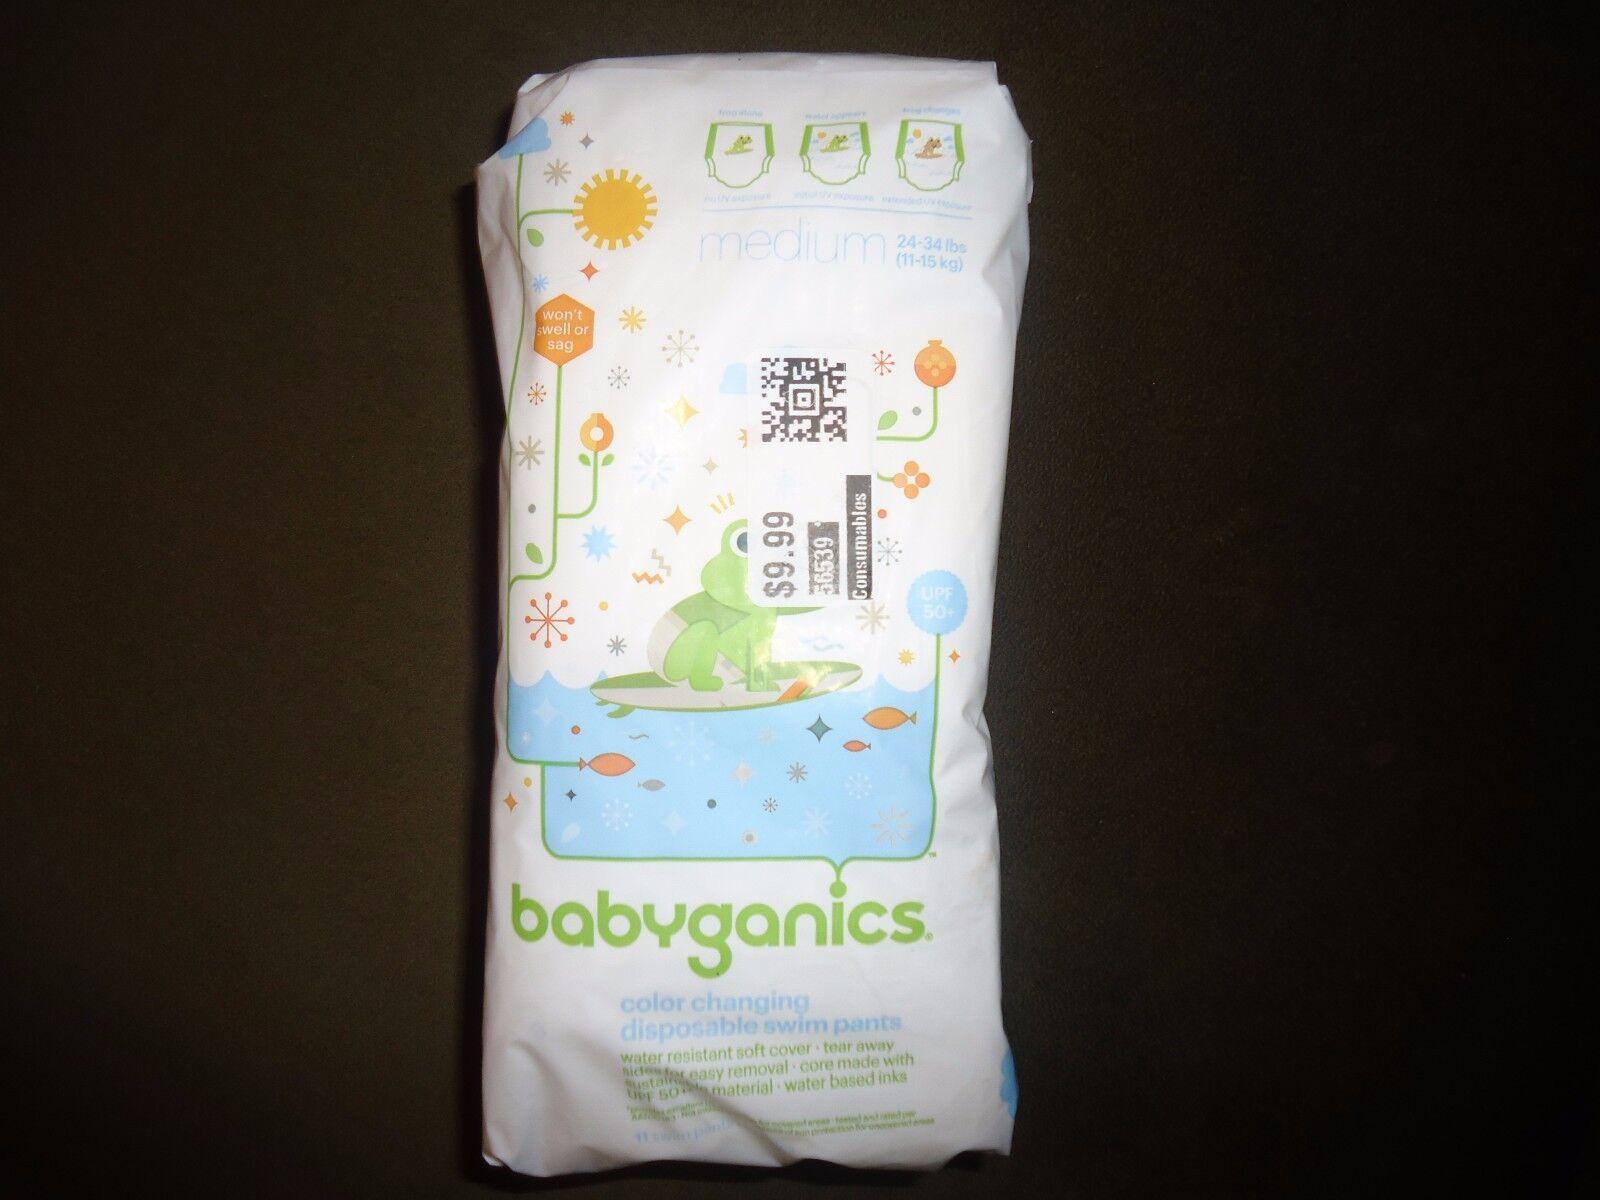 Babyganics Color Changing Disposable Swim Pants UPF50+ Sz Sm